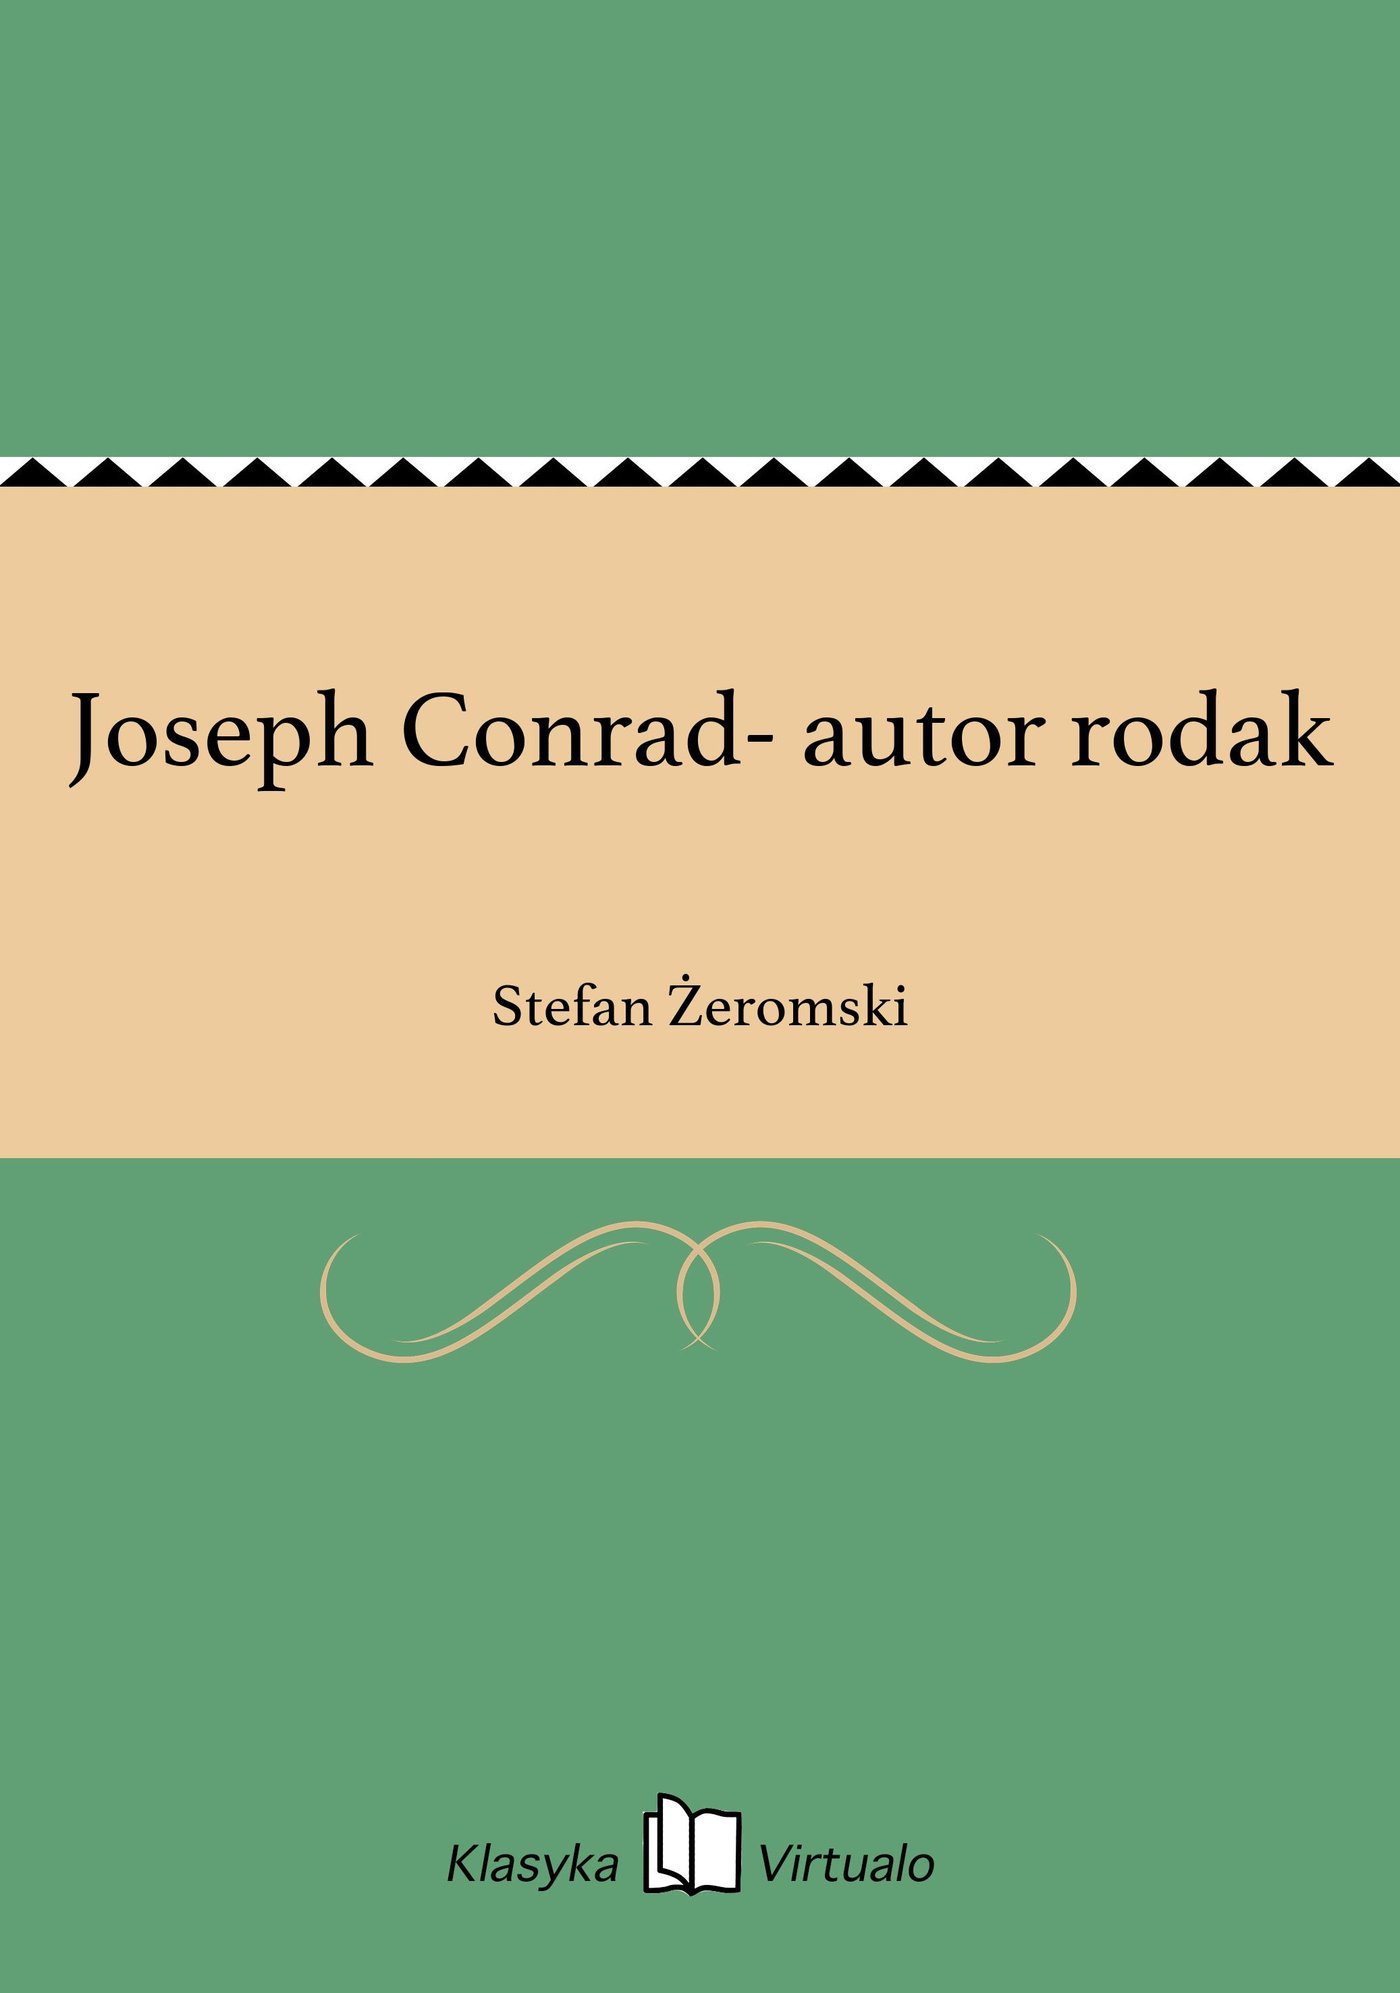 Joseph Conrad- autor rodak - Ebook (Książka EPUB) do pobrania w formacie EPUB